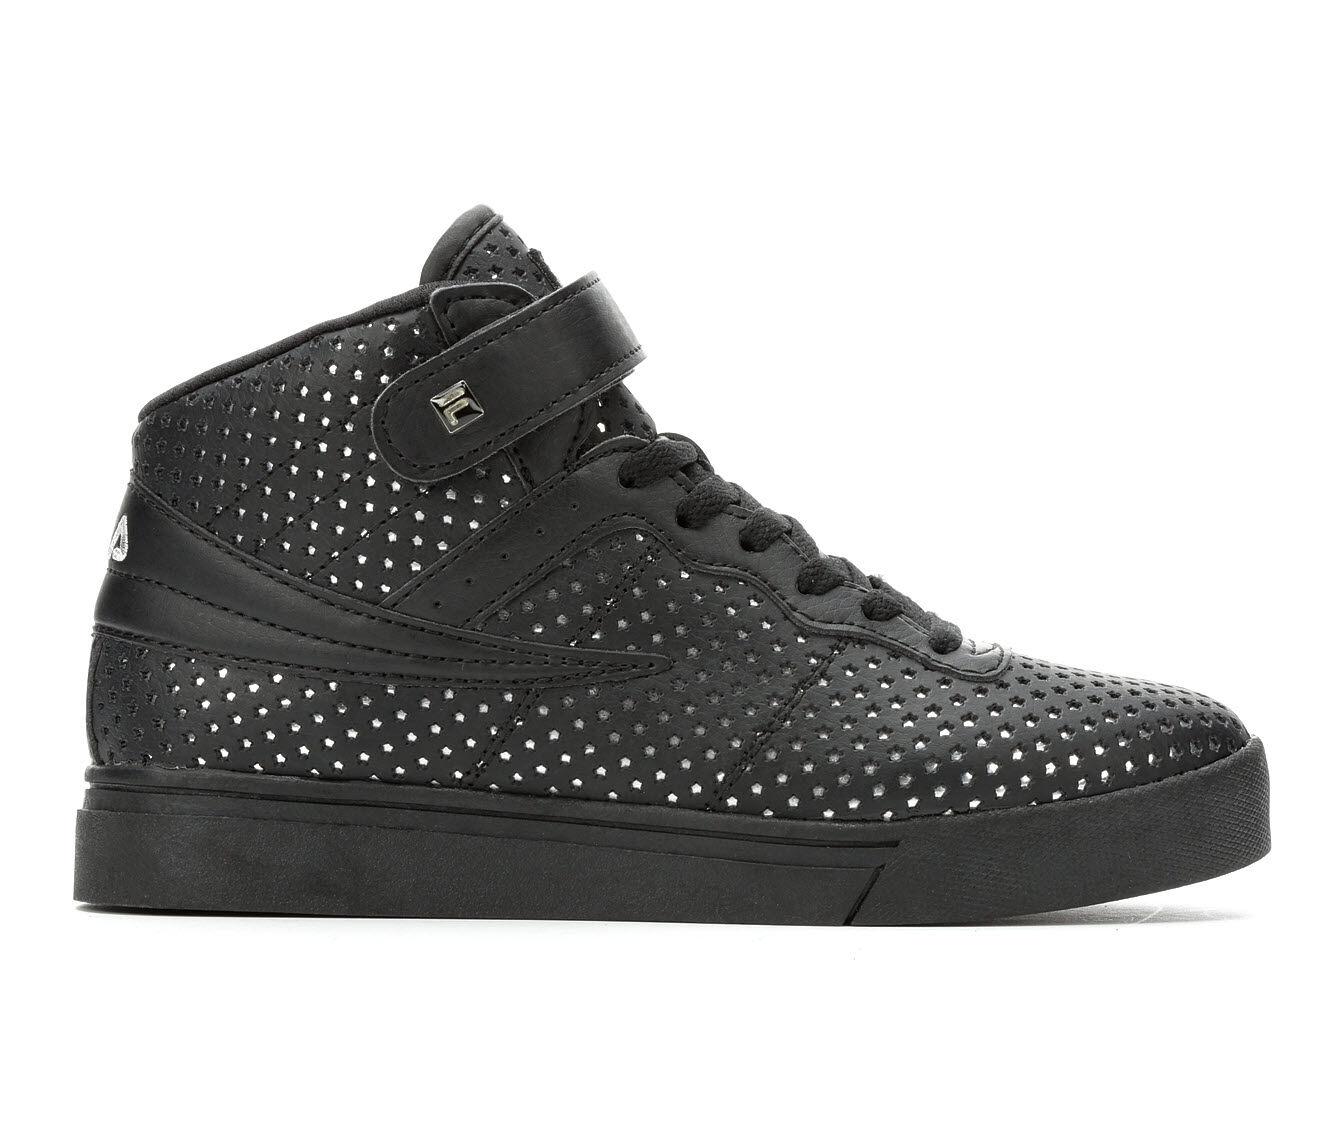 Women's Fila Vulc 13 MP Metallic Stars Basketball Shoes Black/White